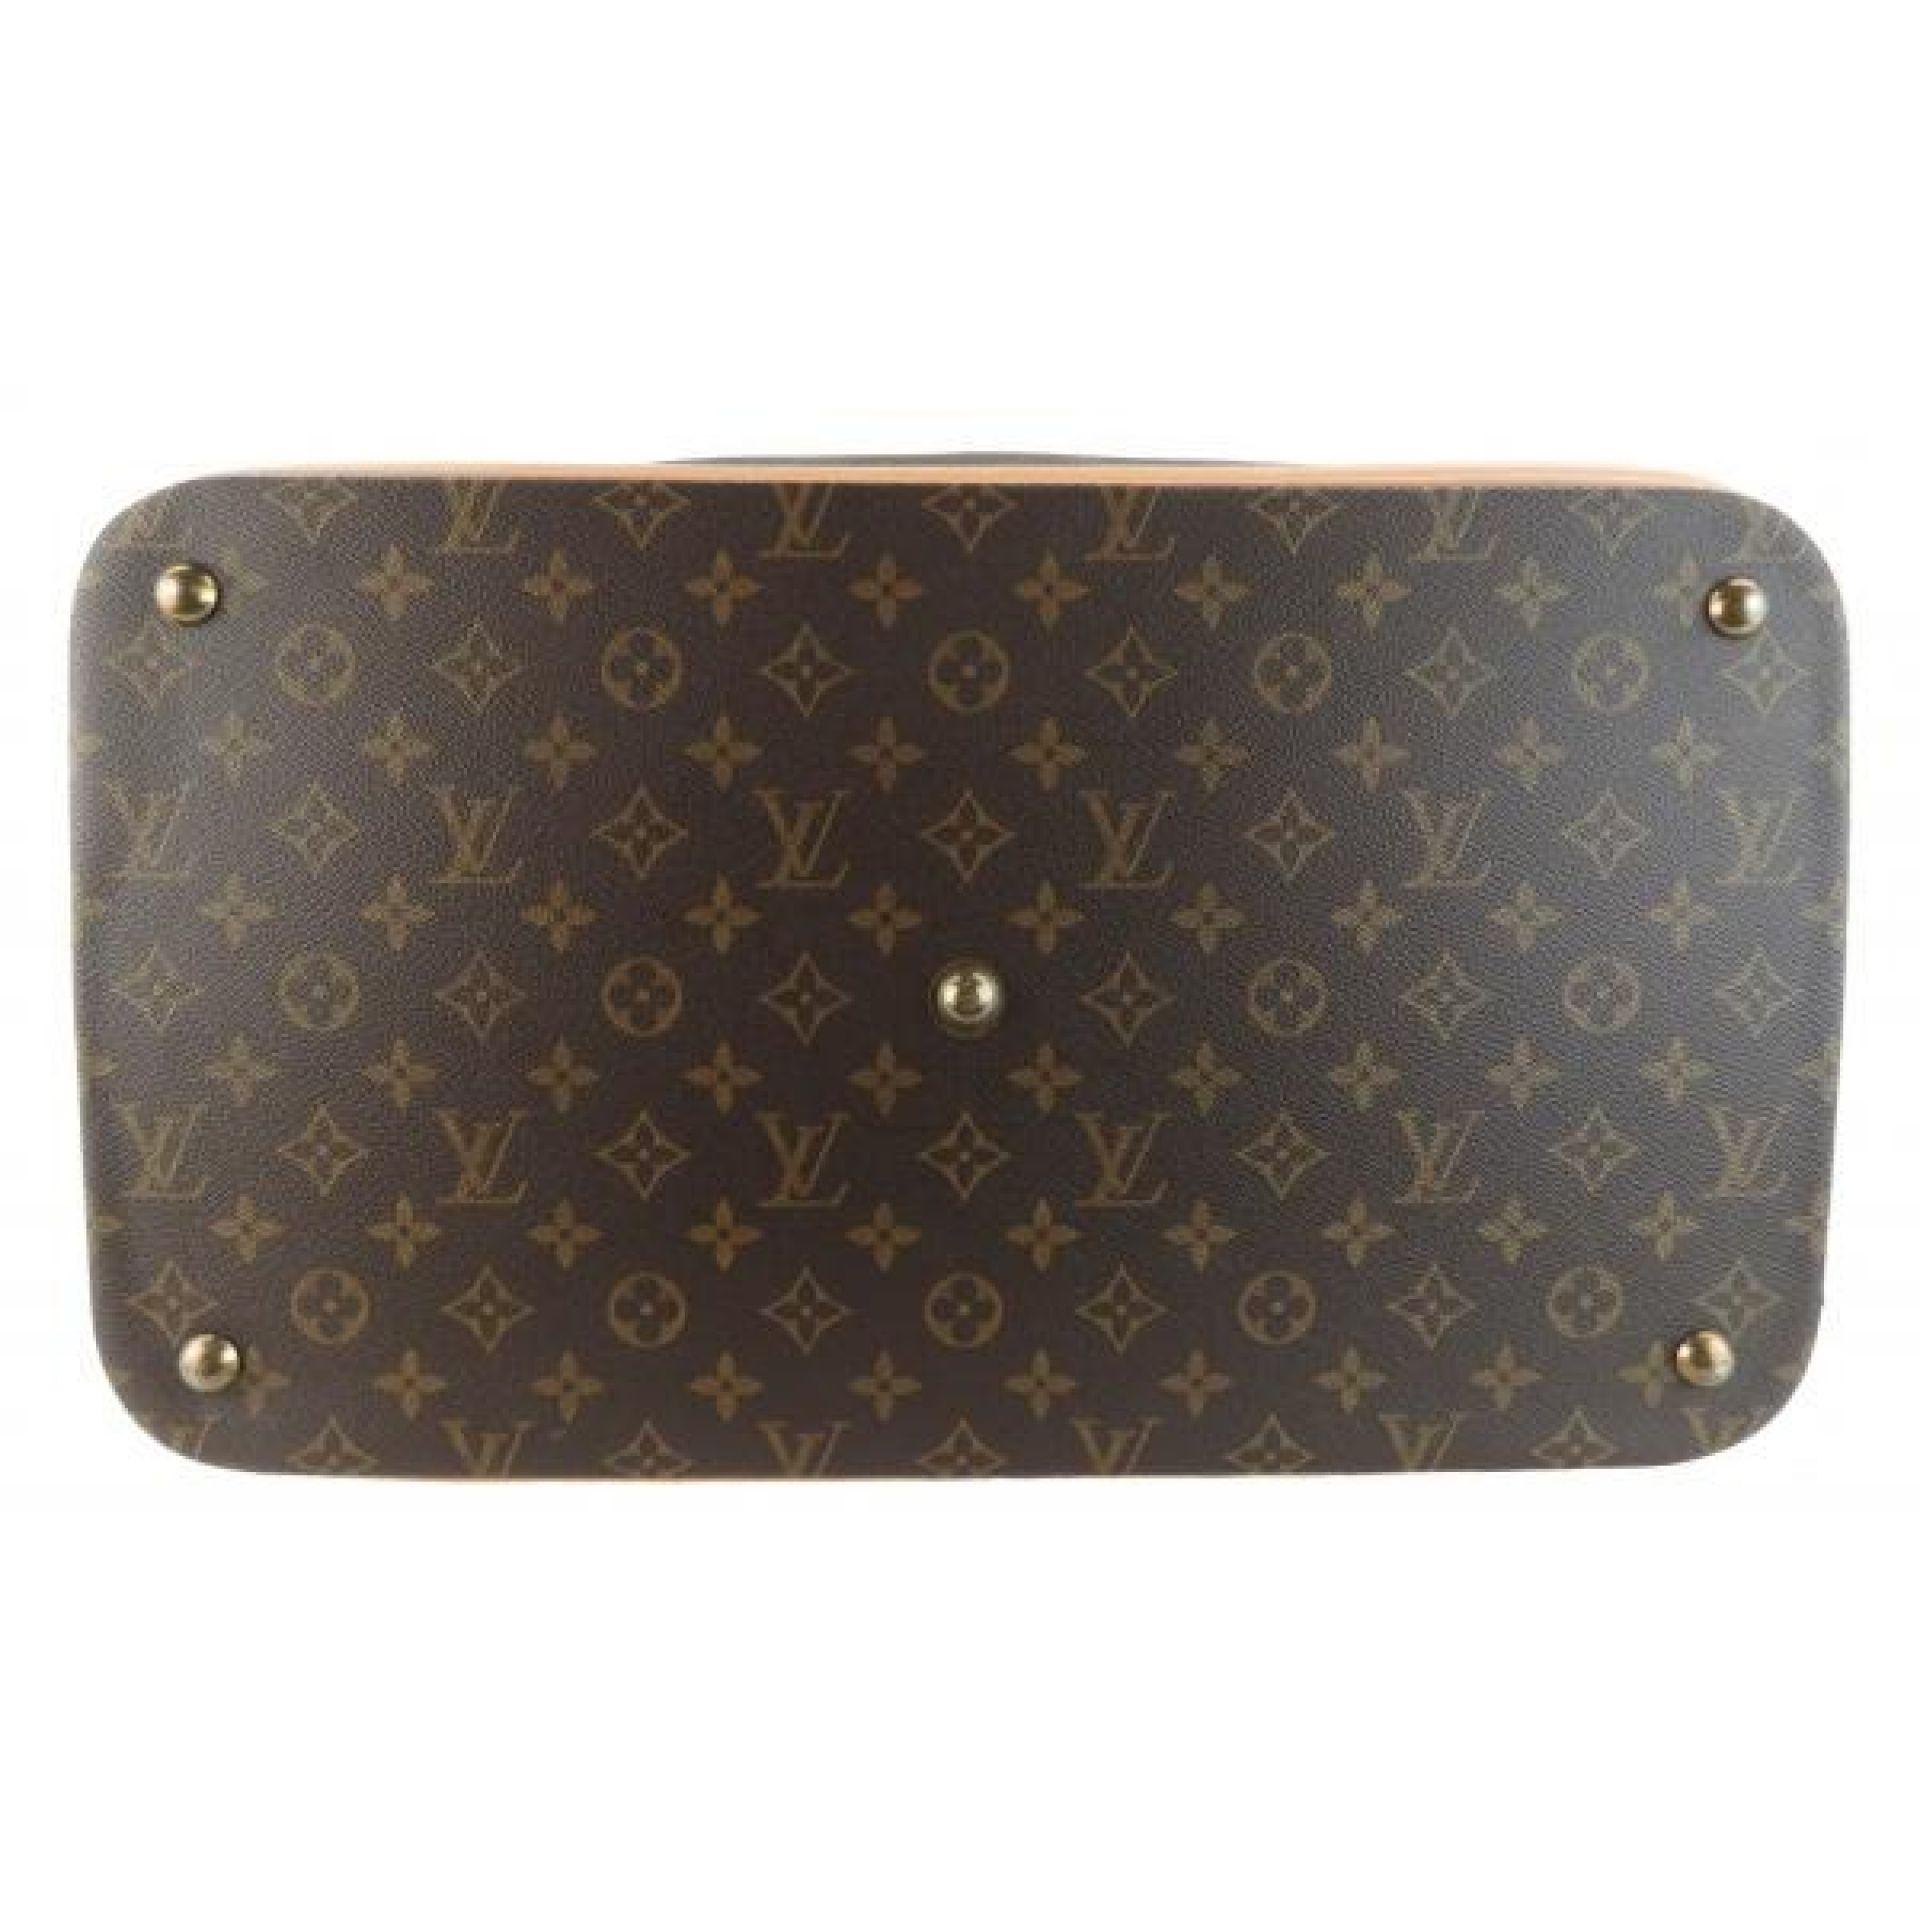 Louis Vuitton Brown Monogram Canvas Cruiser 45 Luggage Bag